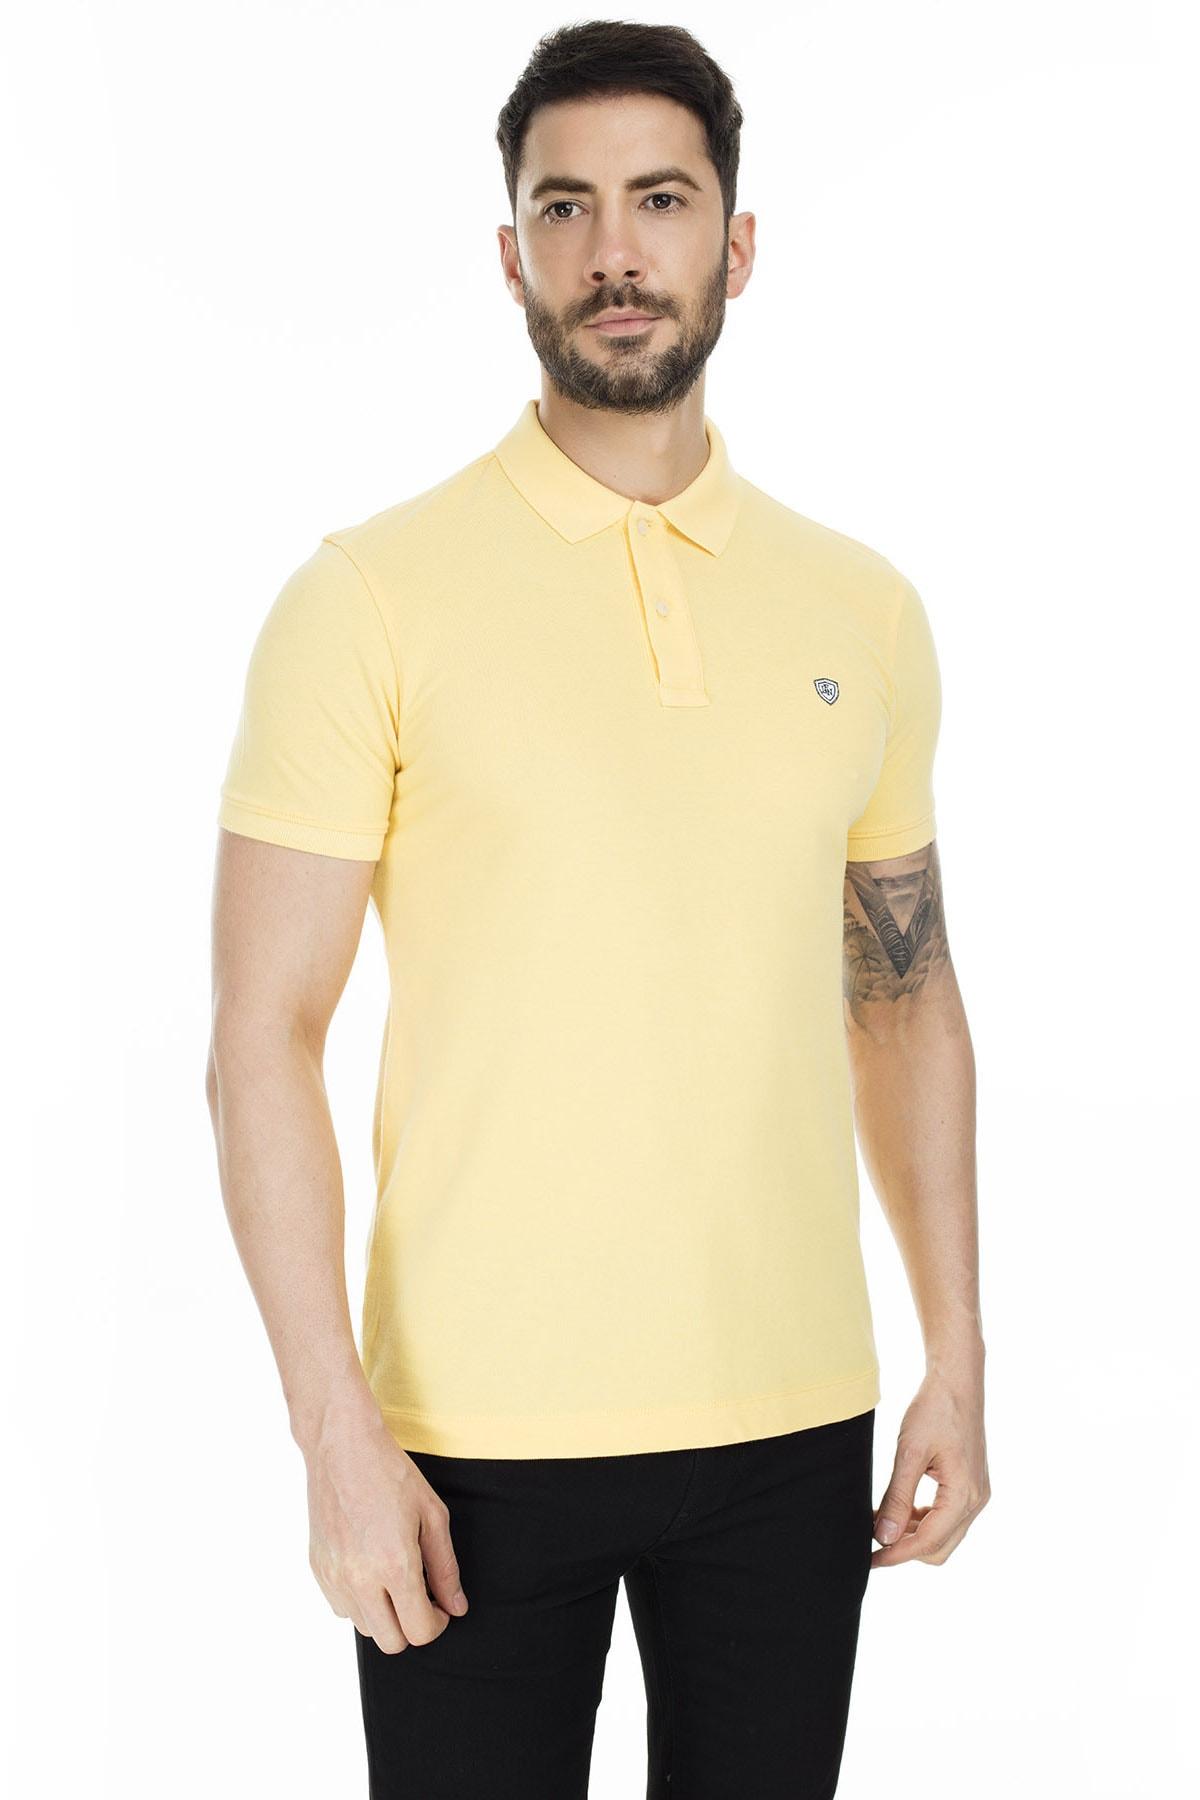 Lufian Laon Spor Polo T- Shirt Sarı 0